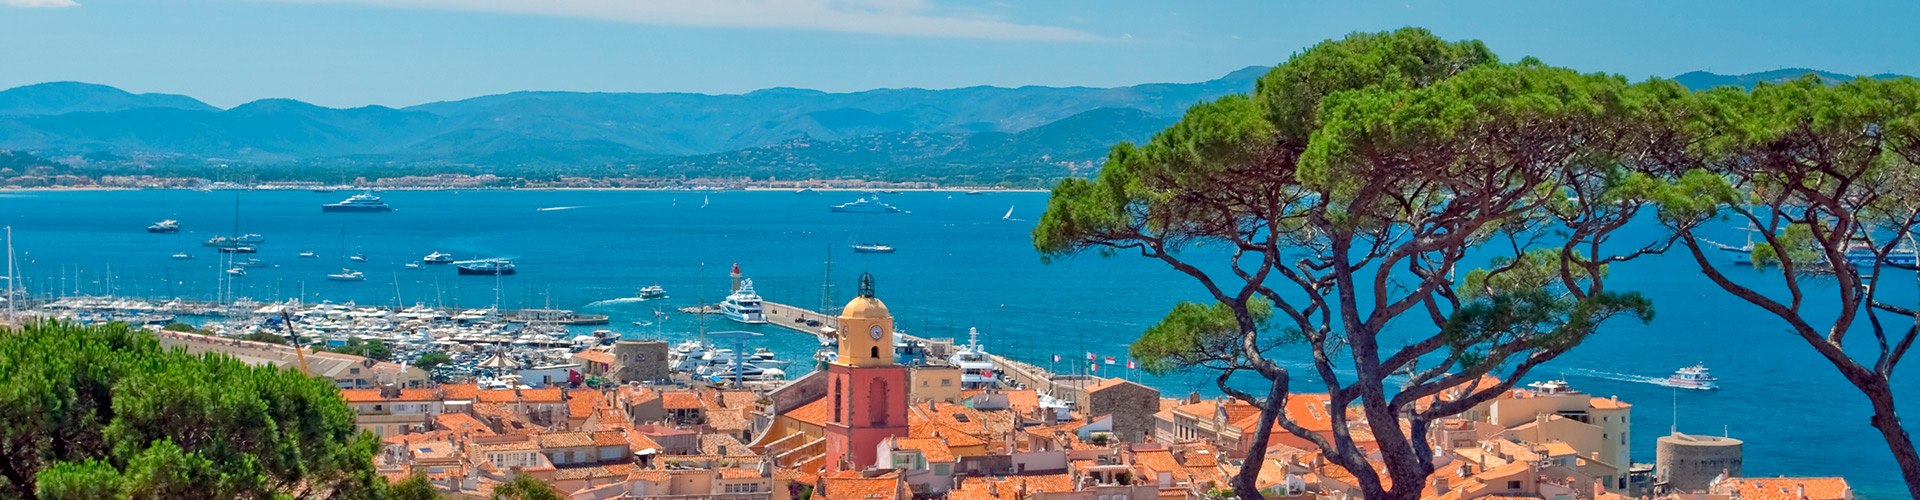 Cote d'Azur Sailing Adventure: Marseille to Nice